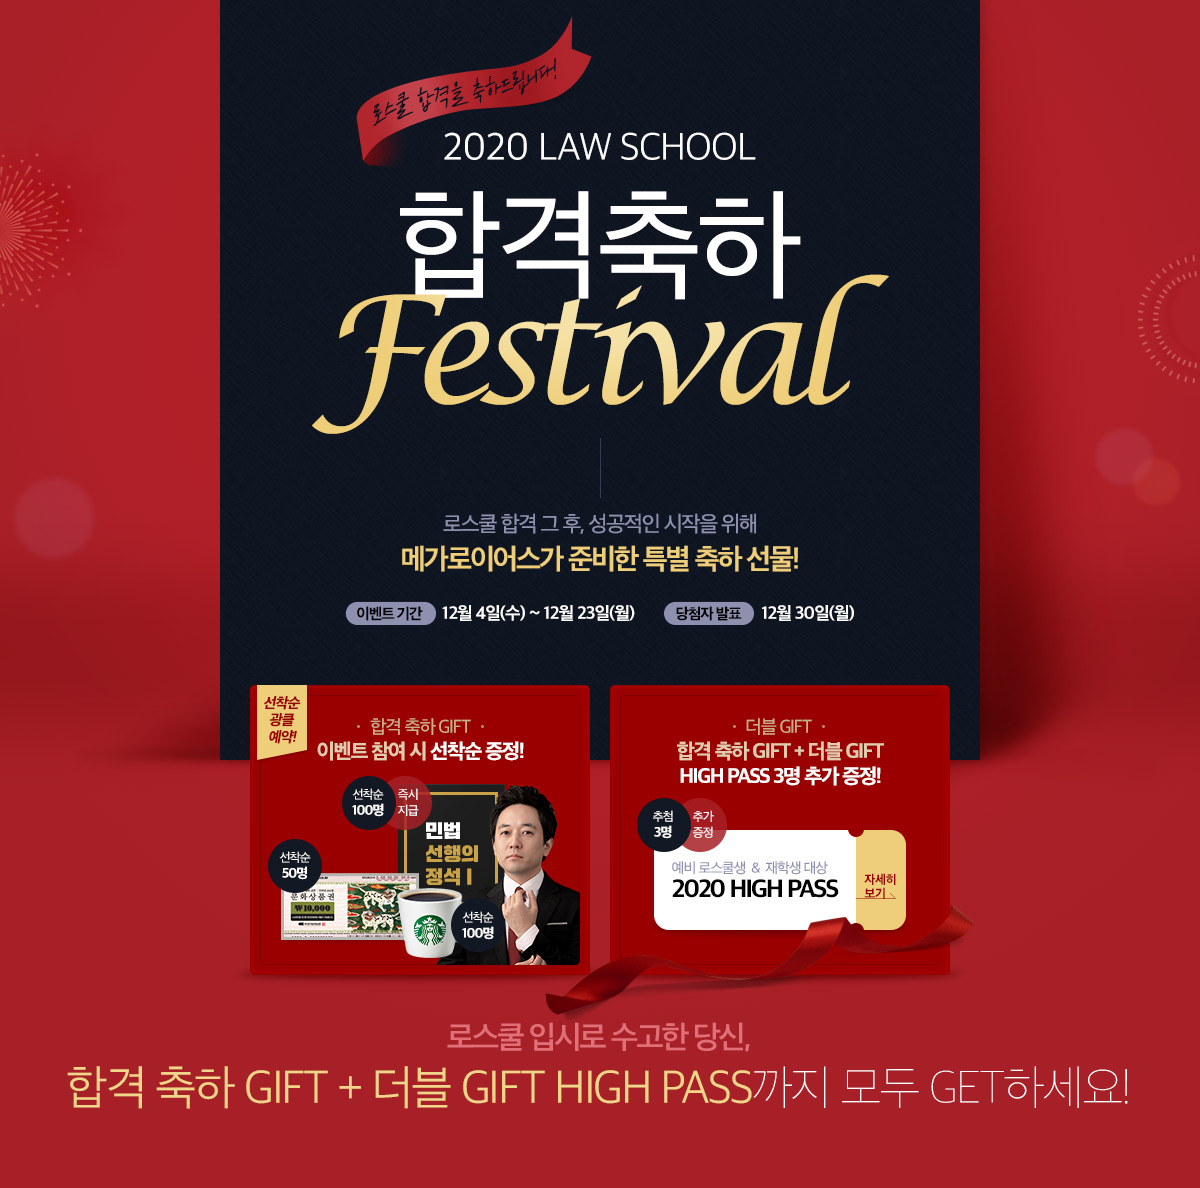 2020 LAW SCHOOL 합격축하 페스티벌